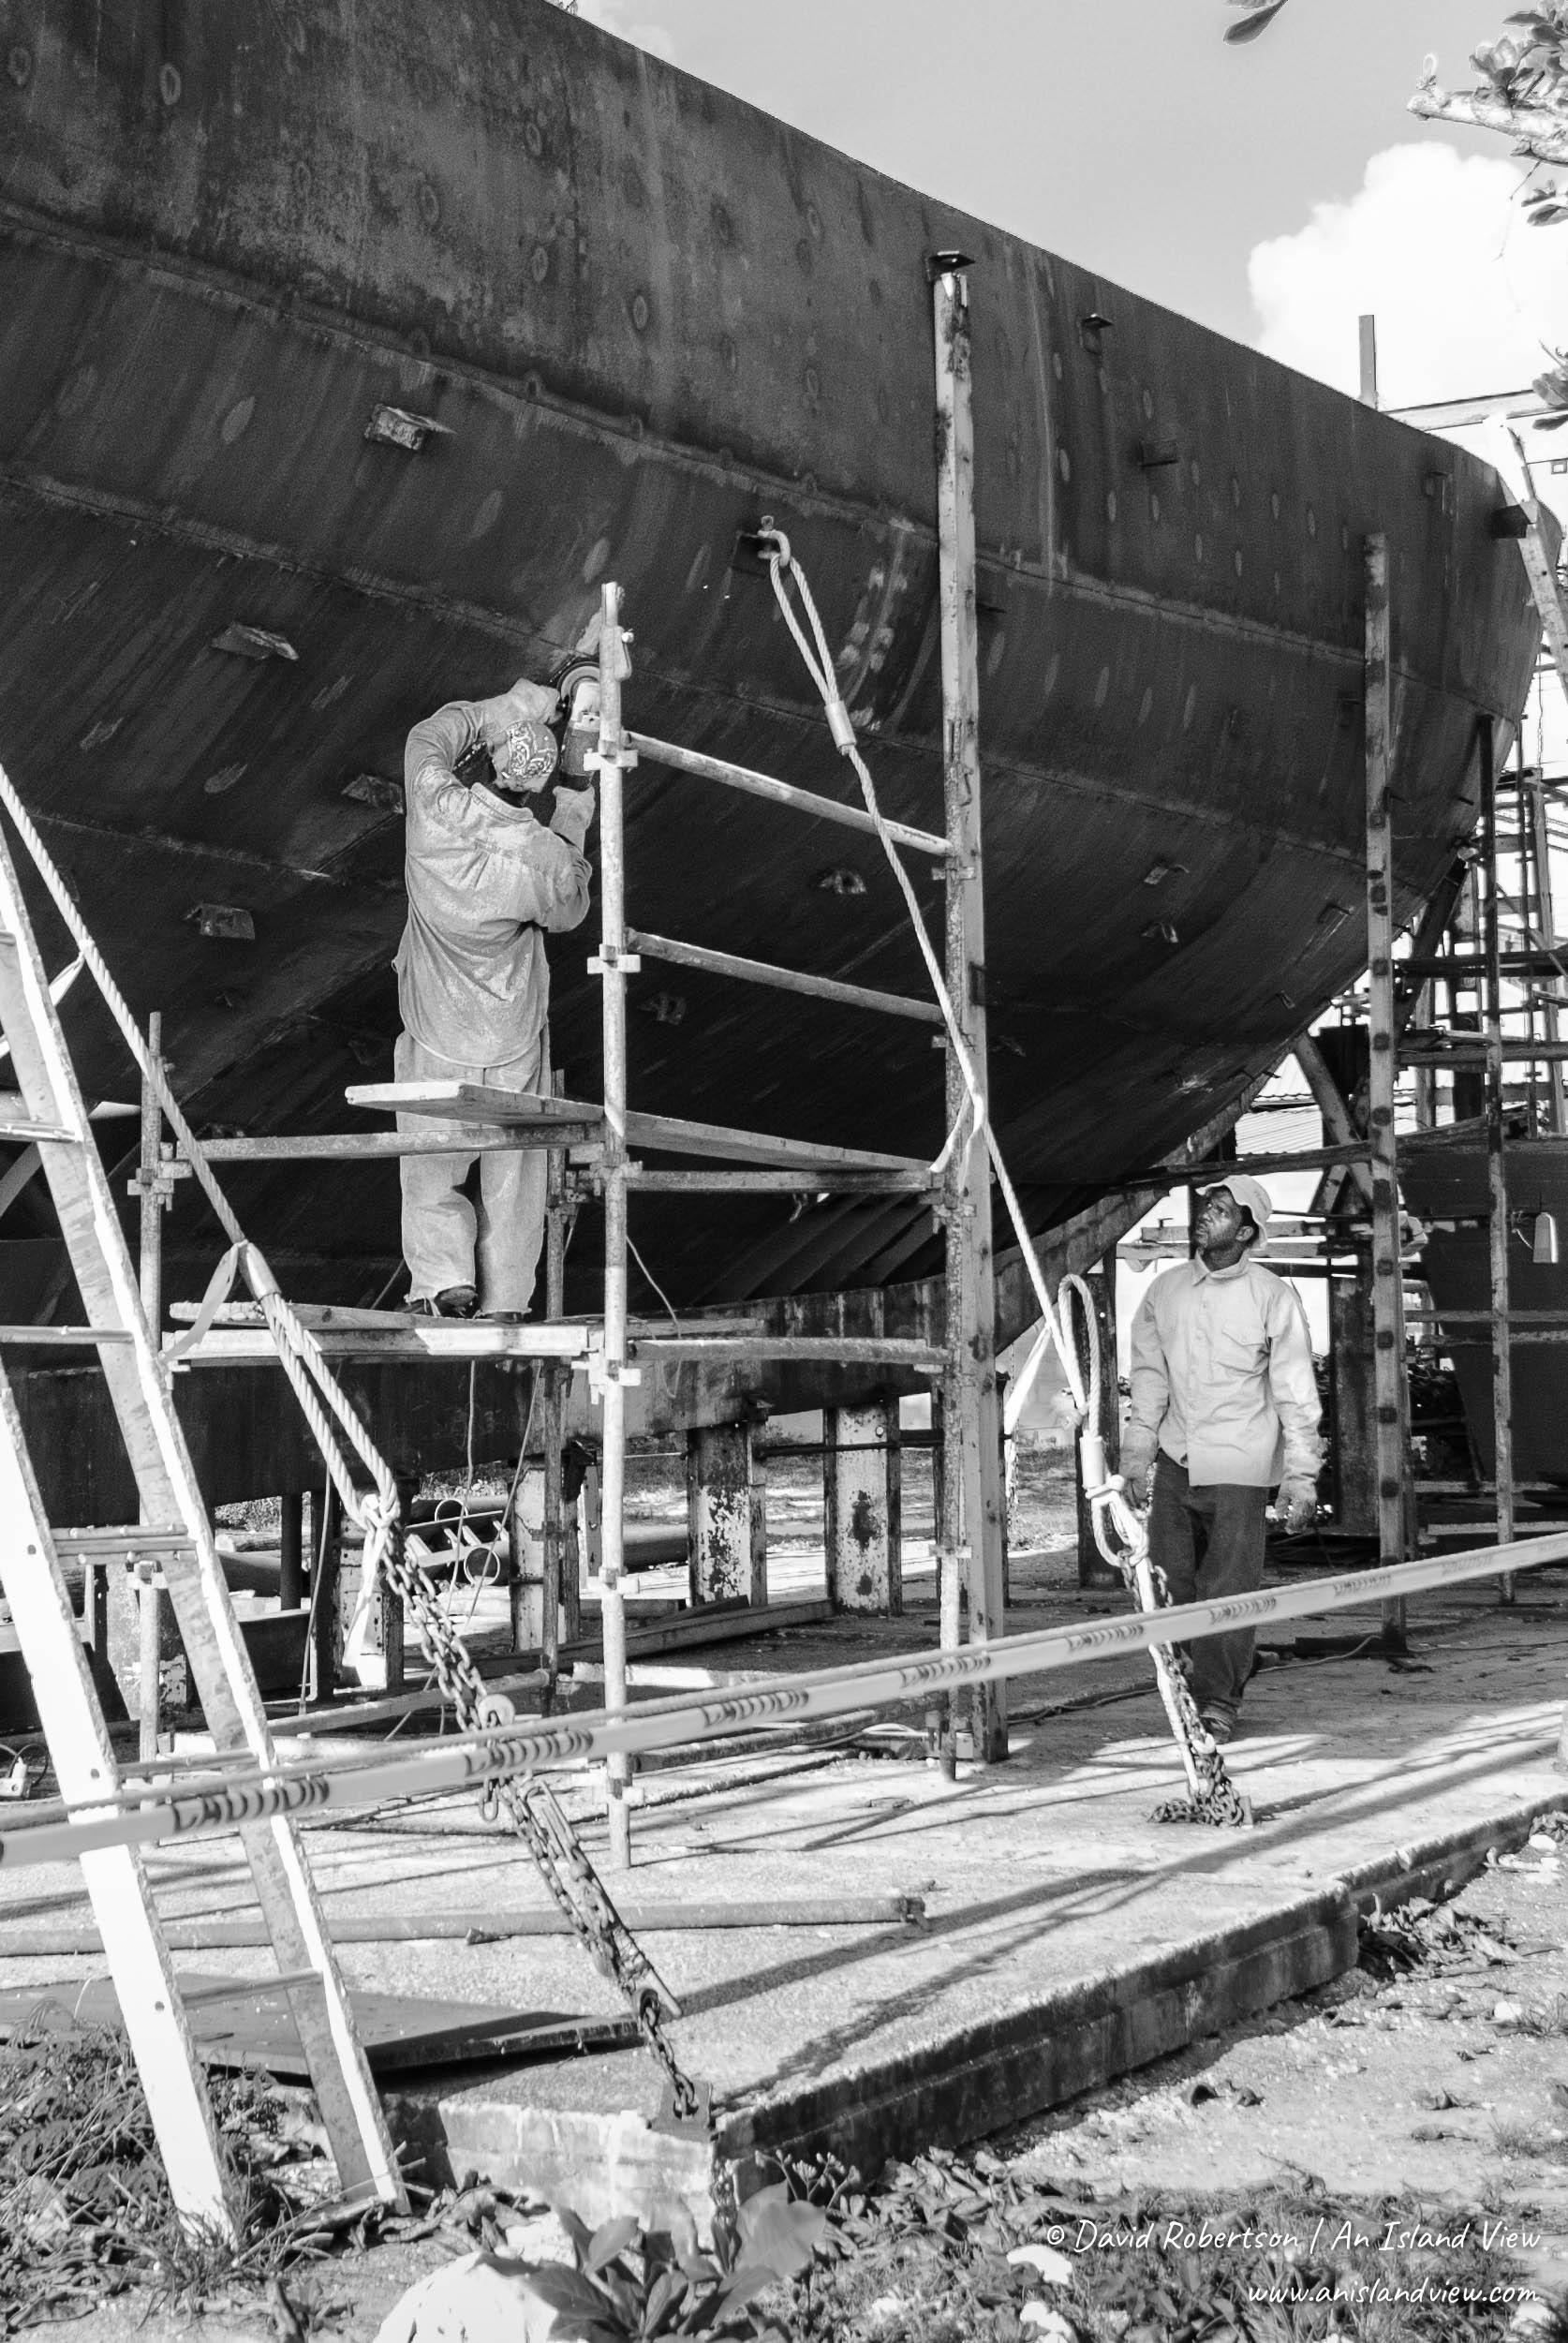 Man working on steel boat hull.